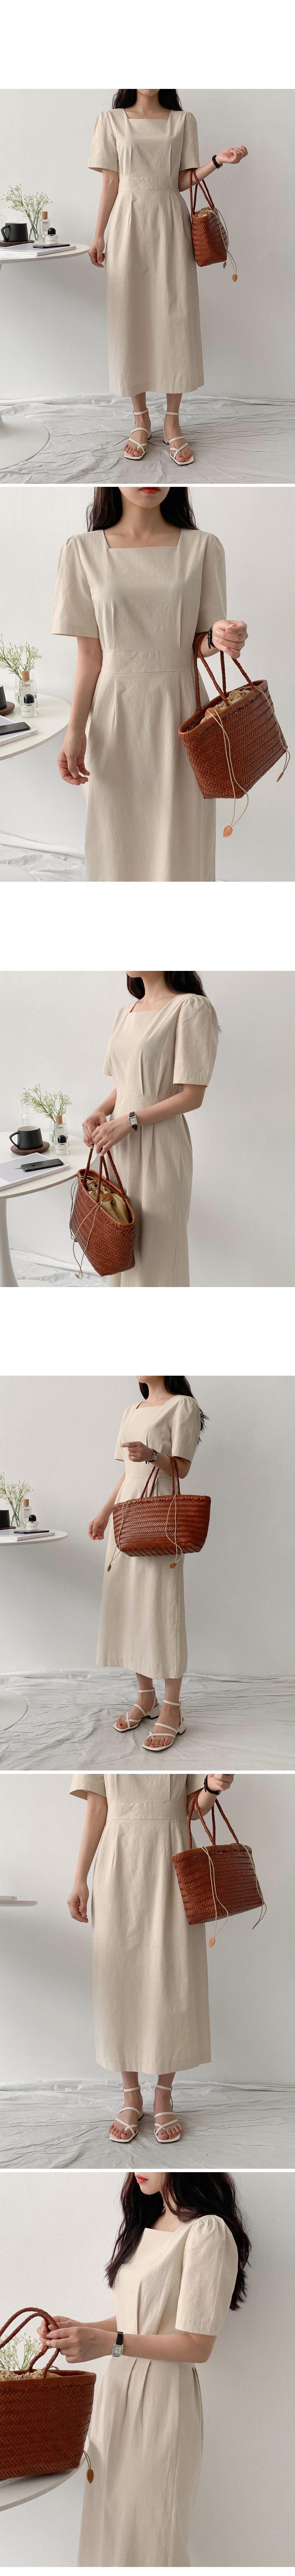 Cowhide Basket Dragon Bag